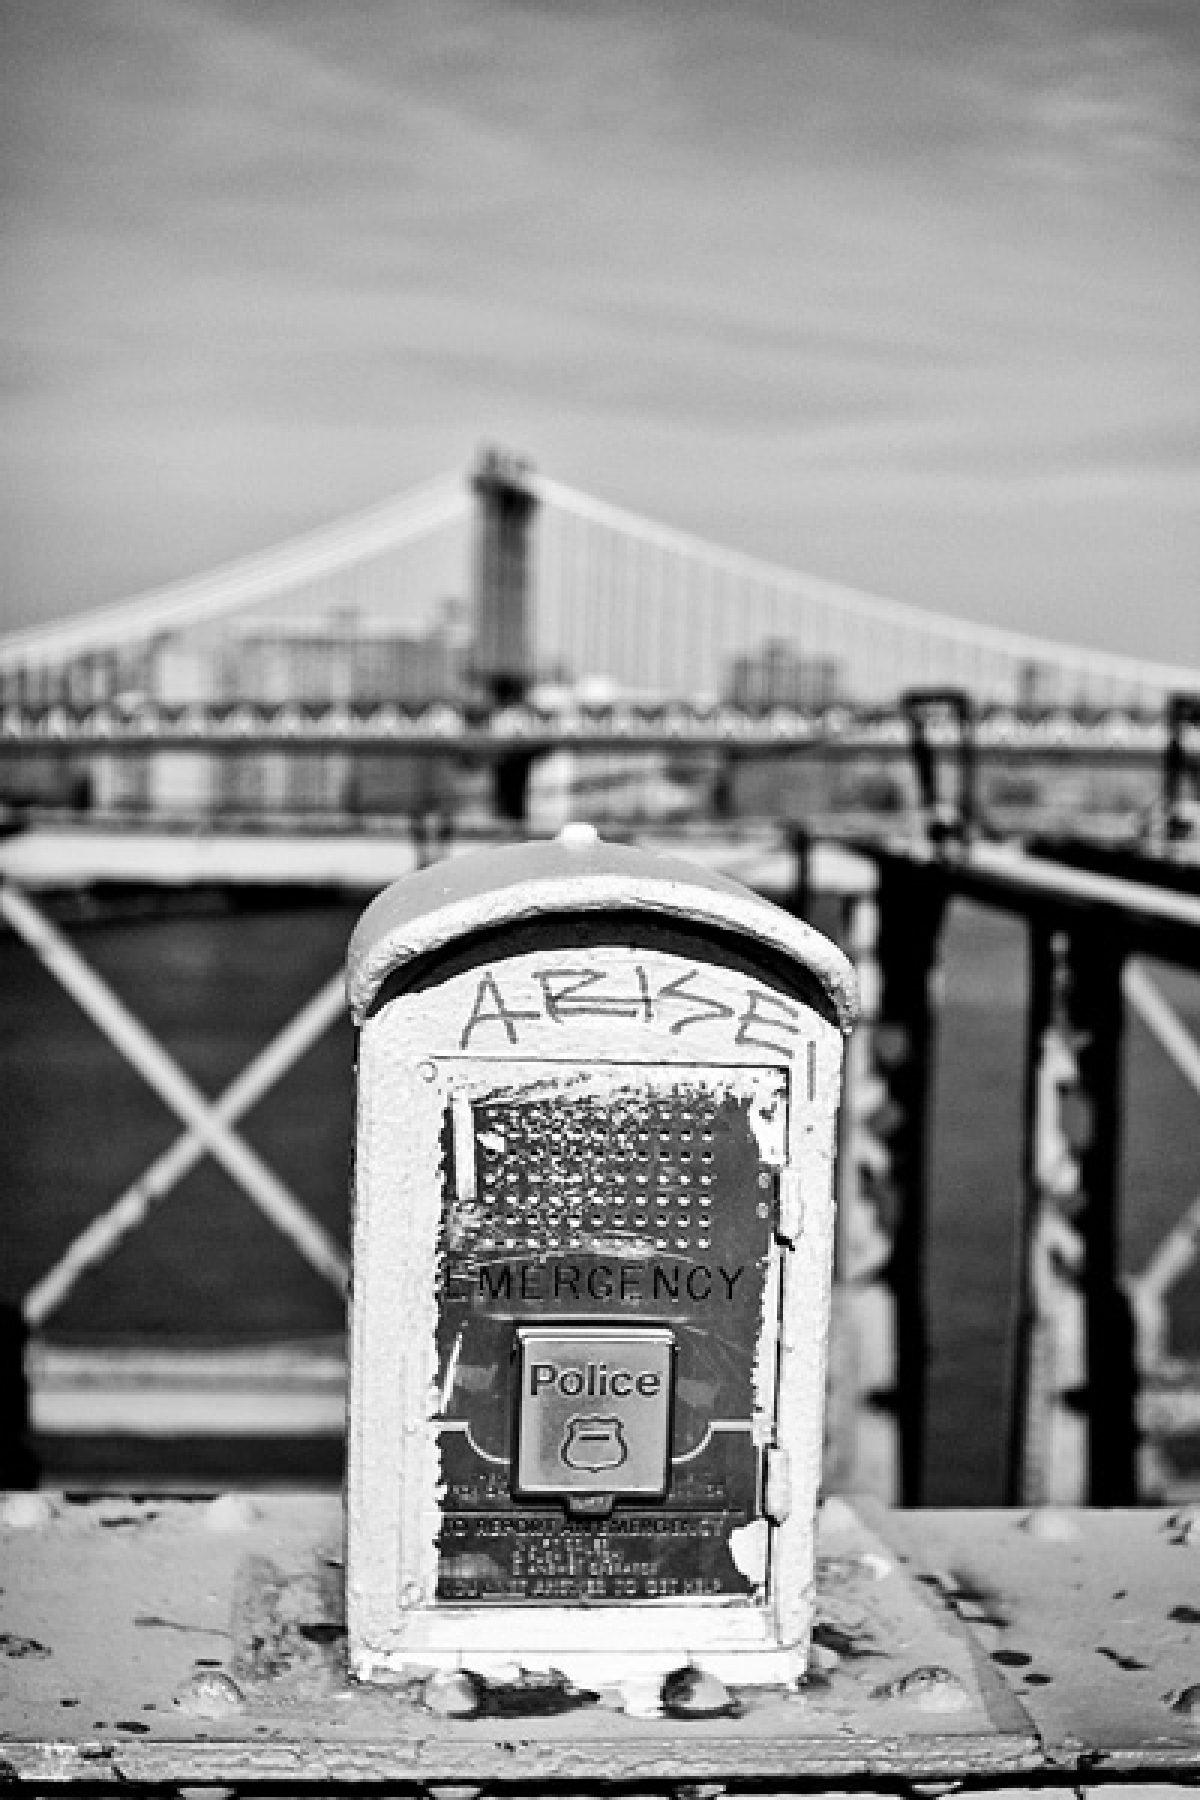 Tableau déco New York, tableau photo plexiglas pont New York, tableau pont New York pas cher,Tableau photo décoration murale. Tableau toile photo